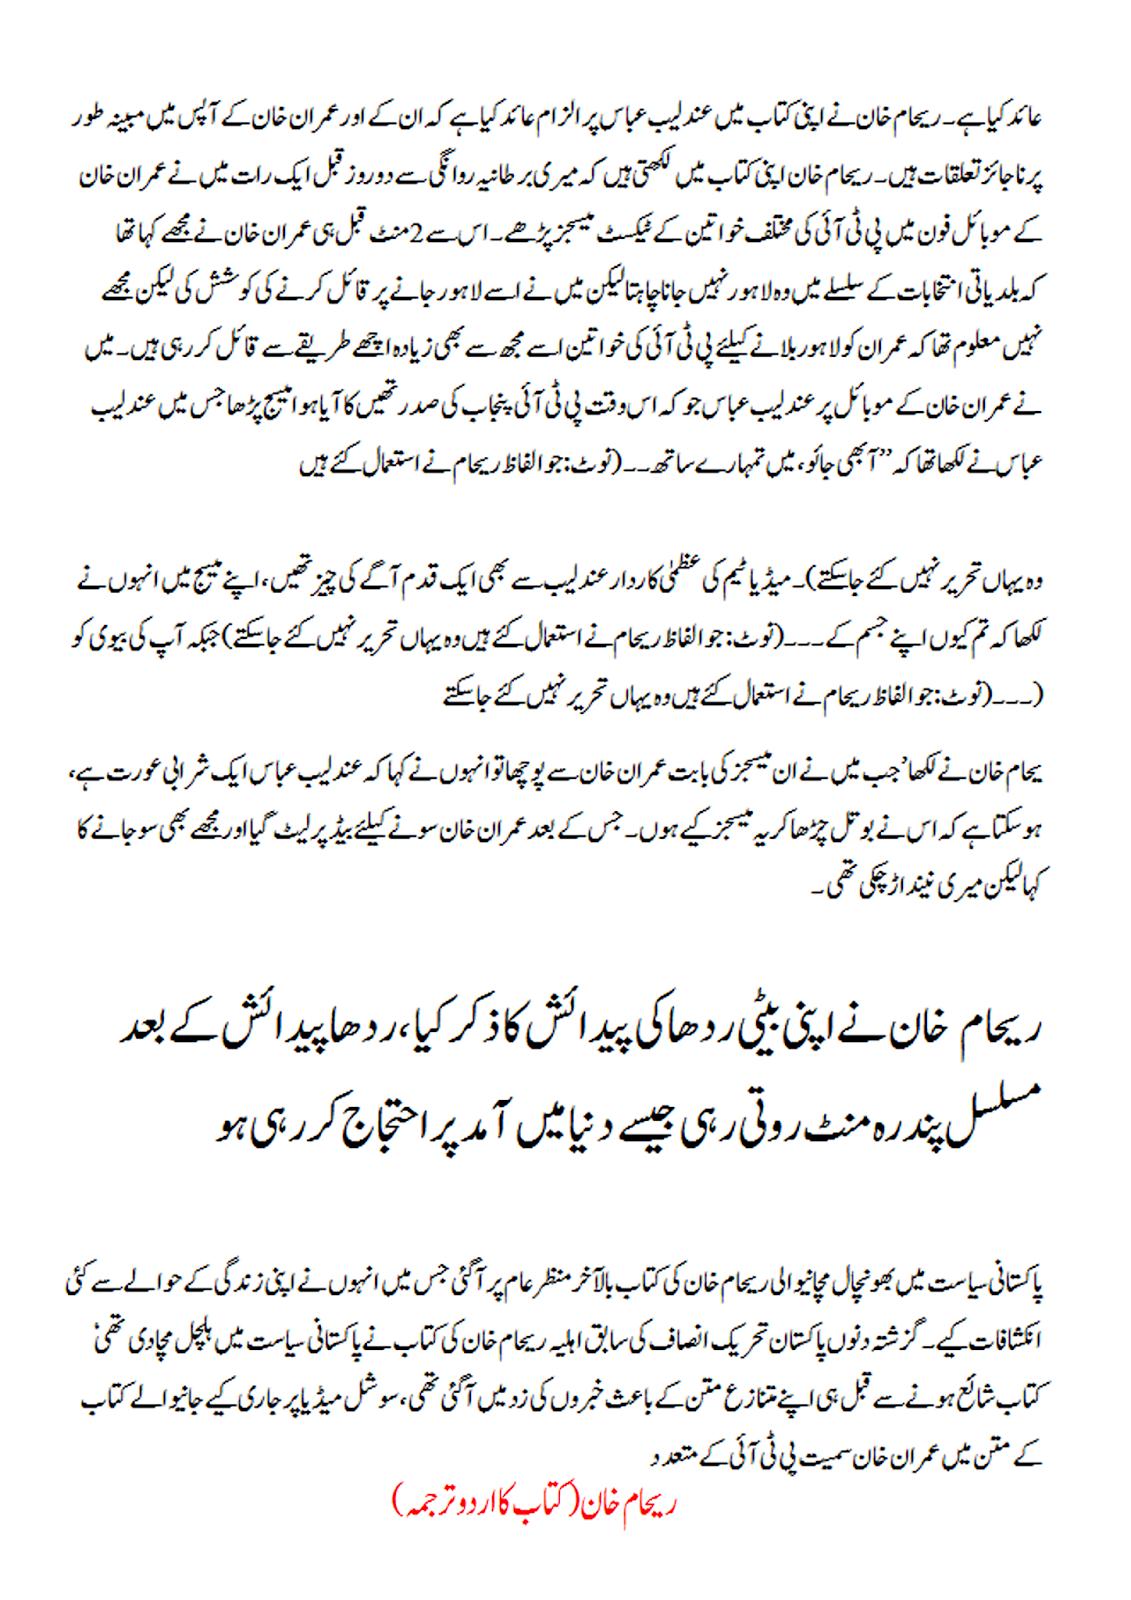 Reham Khan Book download, Reham Khan Book pdf free, Reham Khan Book pdf free download, reham khan book urdu download, reham khan's book download, Reham Khan's Book pdf free download urdu,